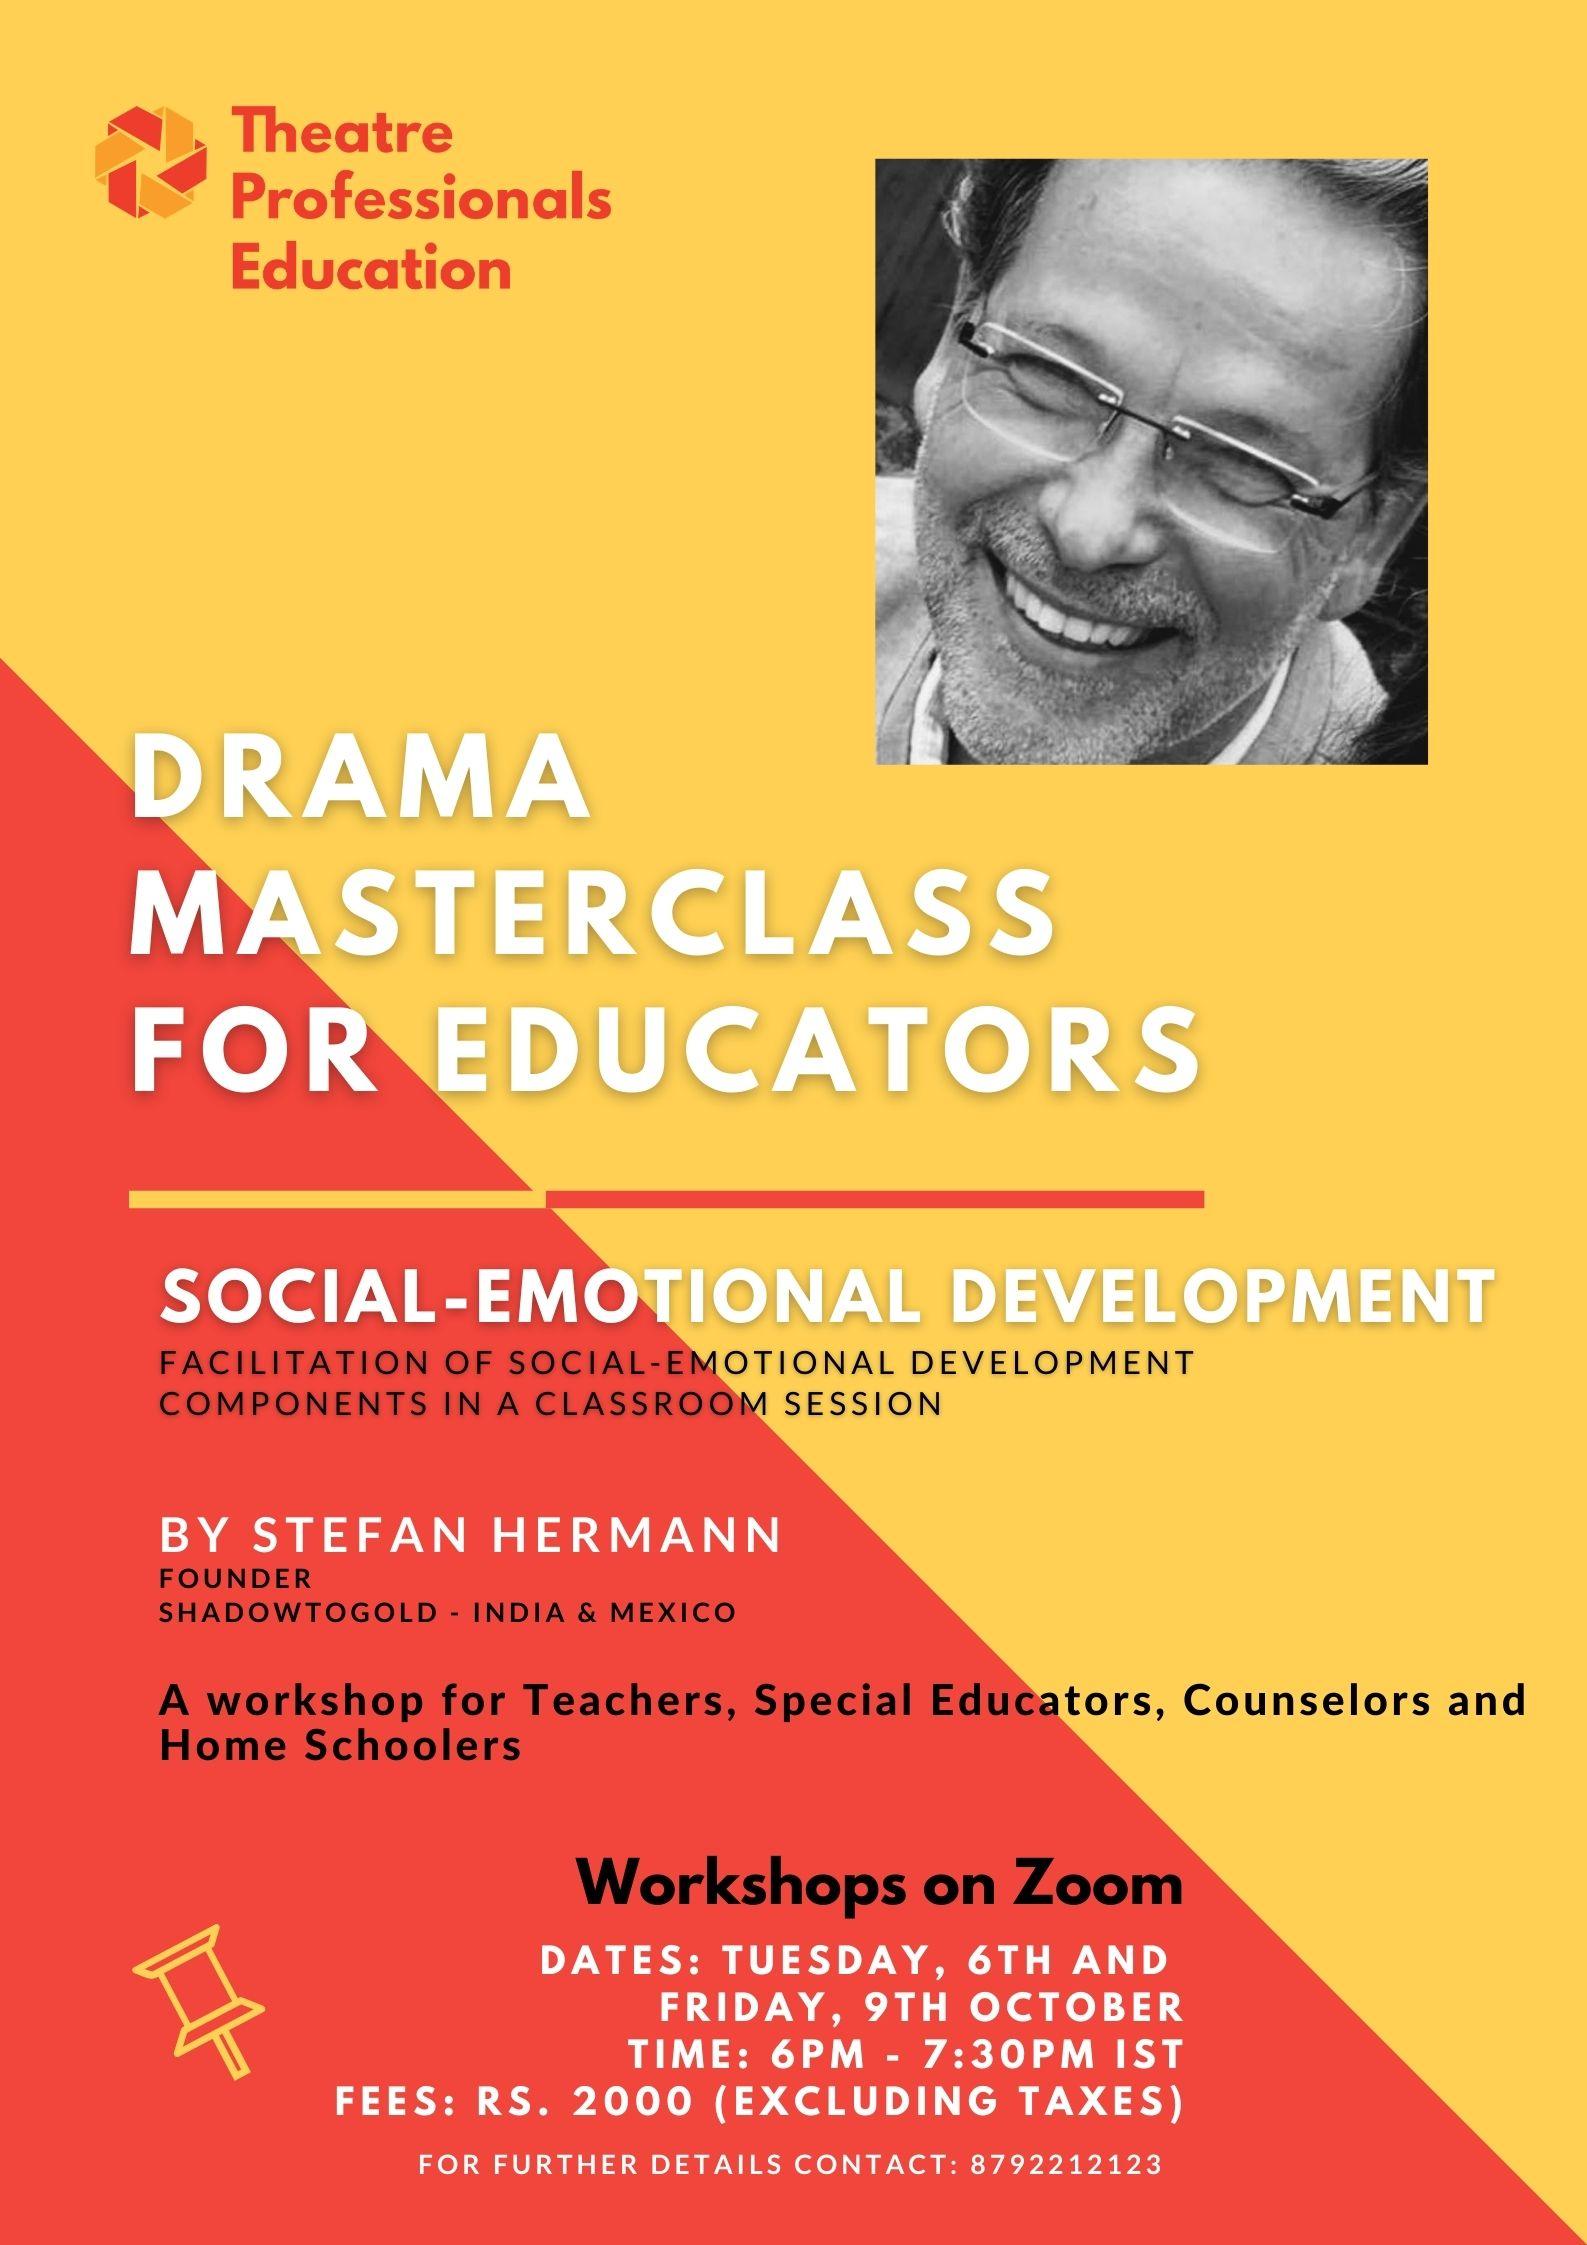 Stefan - DRAMA MASTERCLASS FOR EDUCATORS (1)